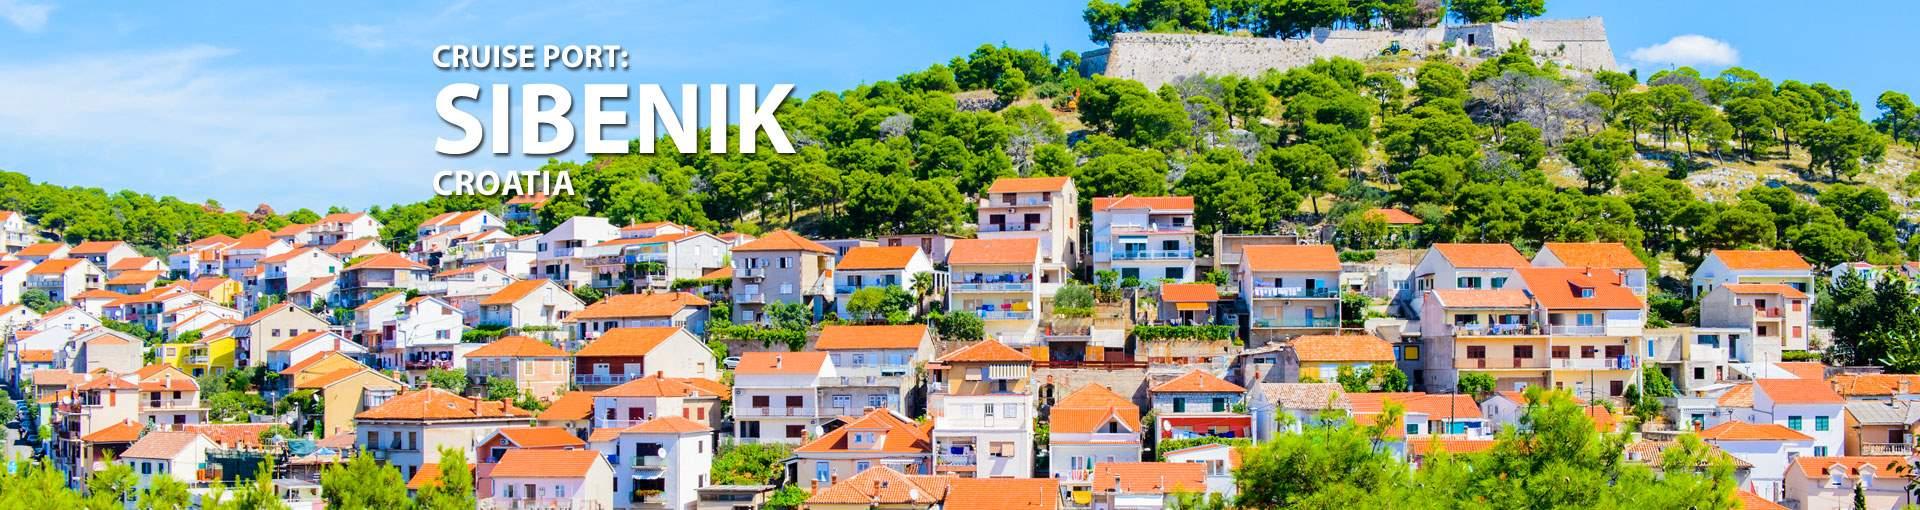 Cruises to Sibenik, Croatia